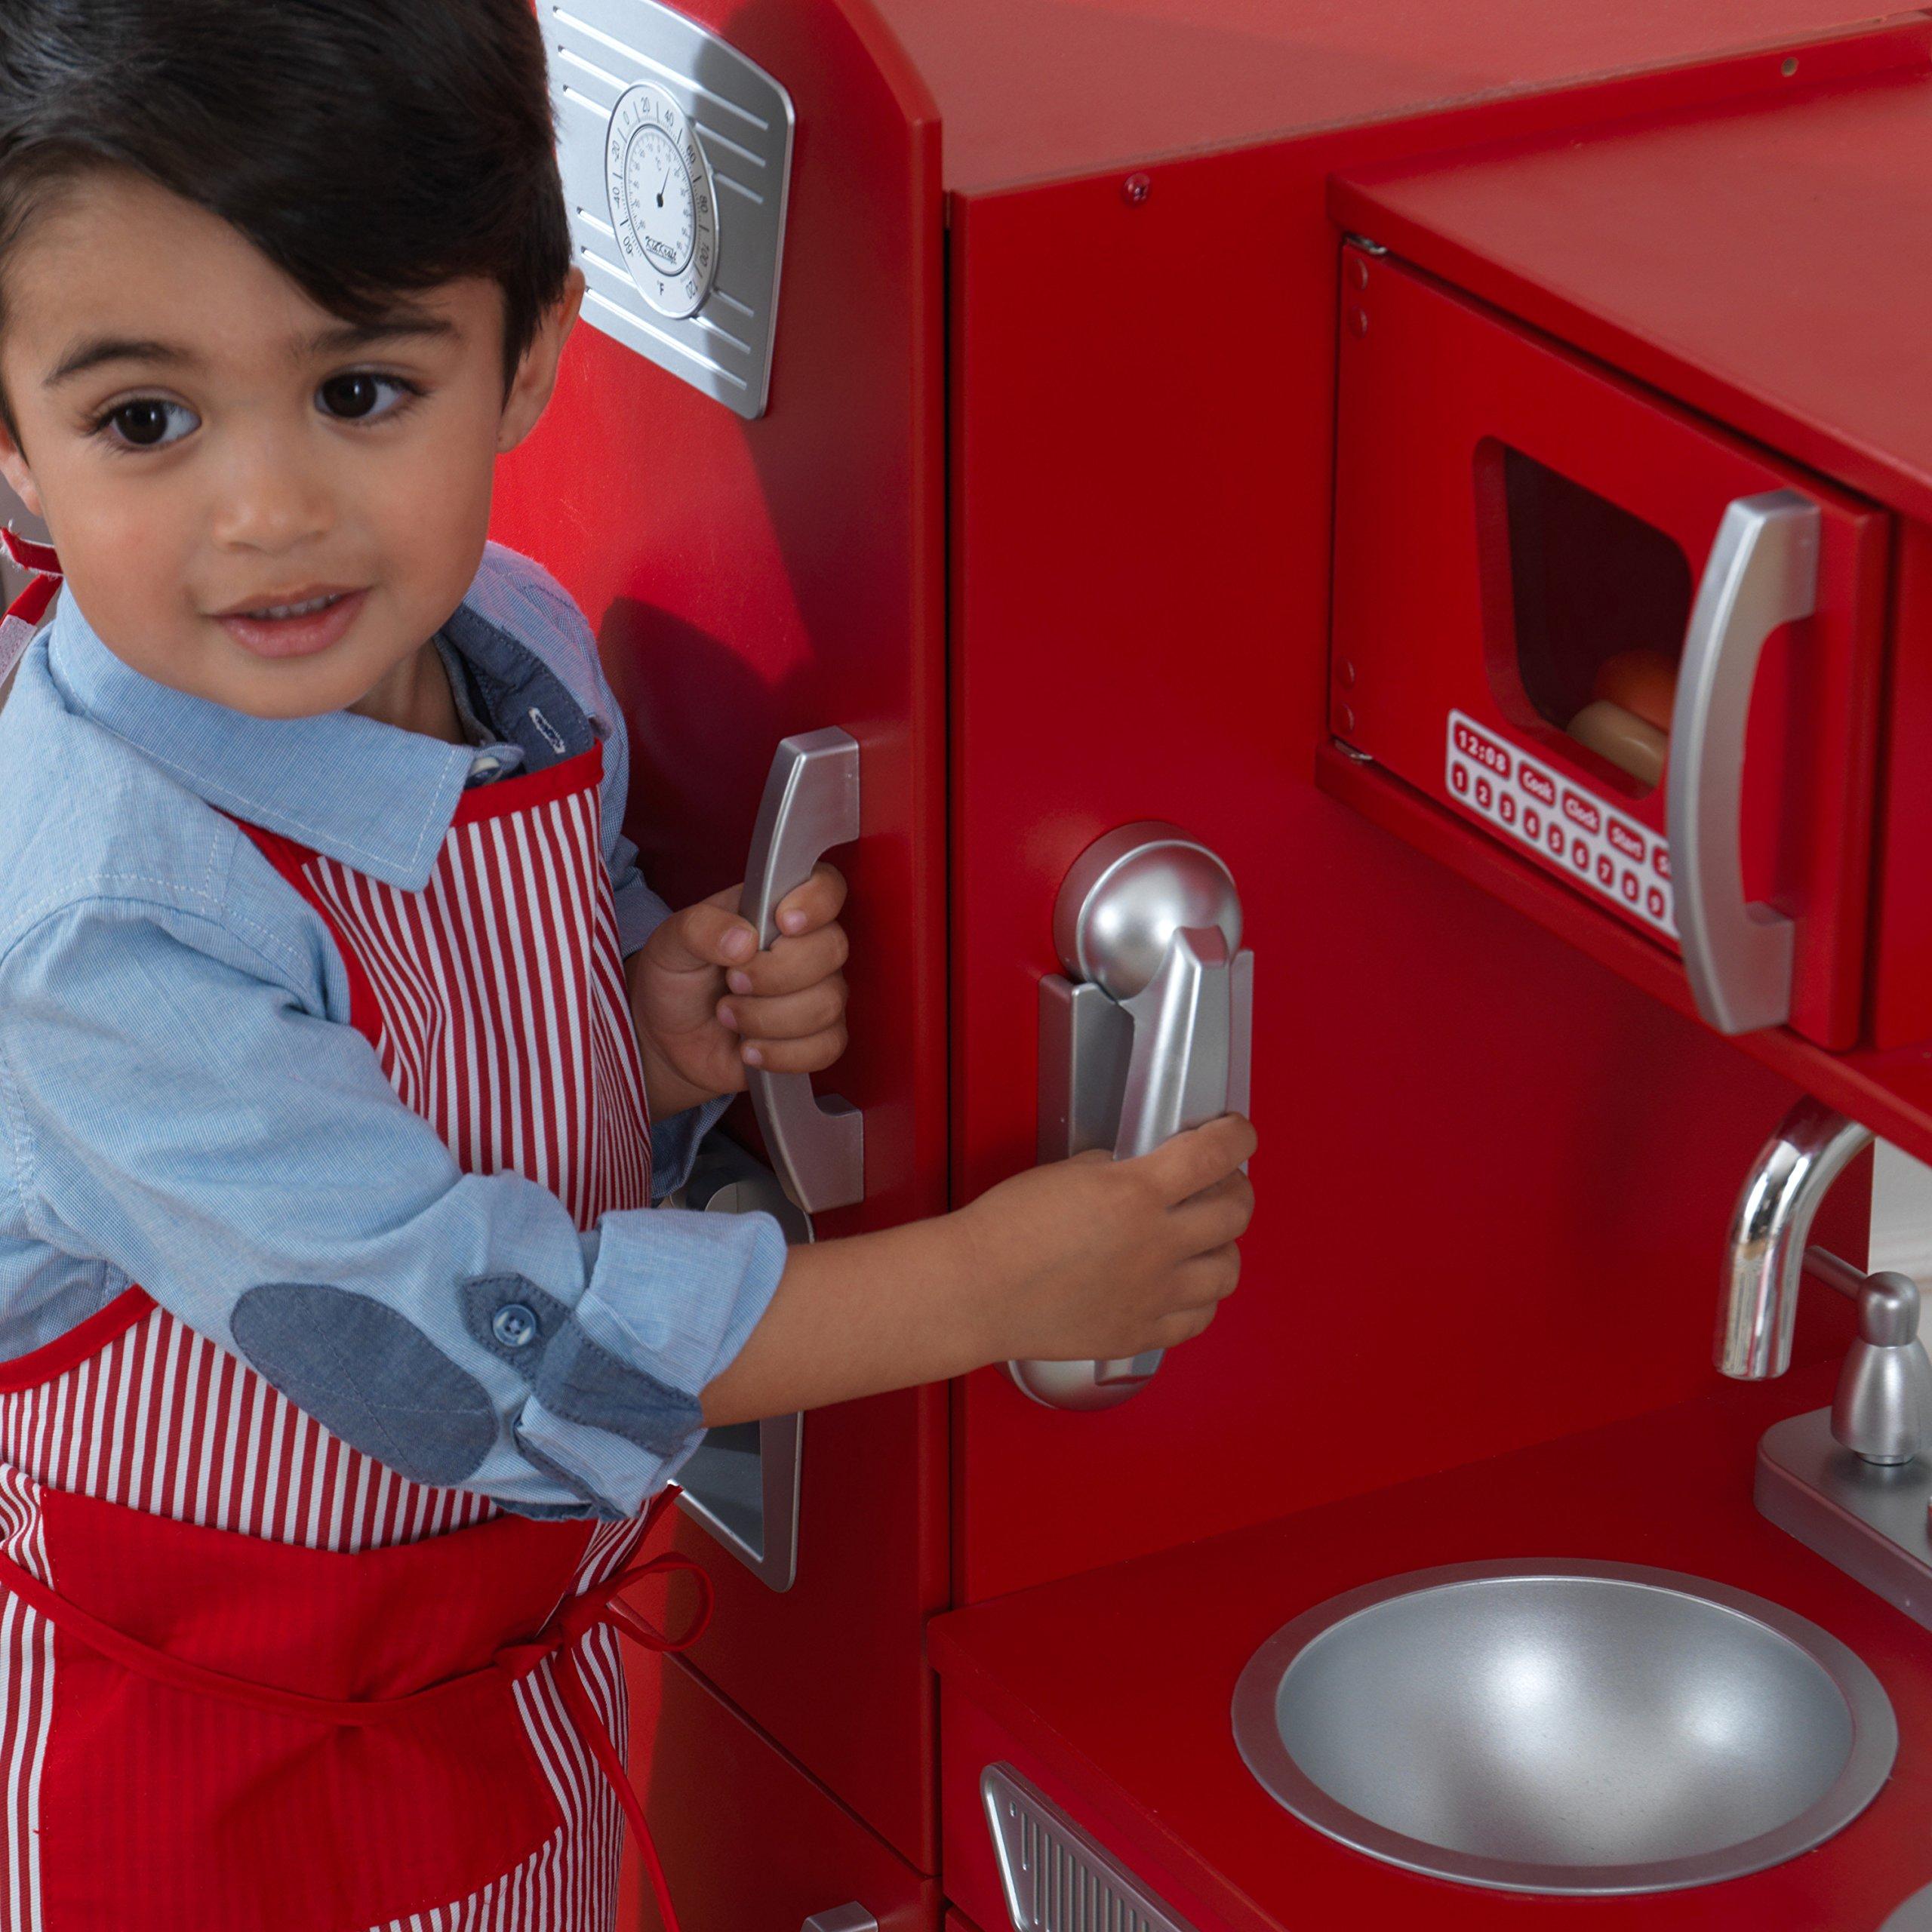 KidKraft Vintage Play Kitchen - Red by KidKraft (Image #11)